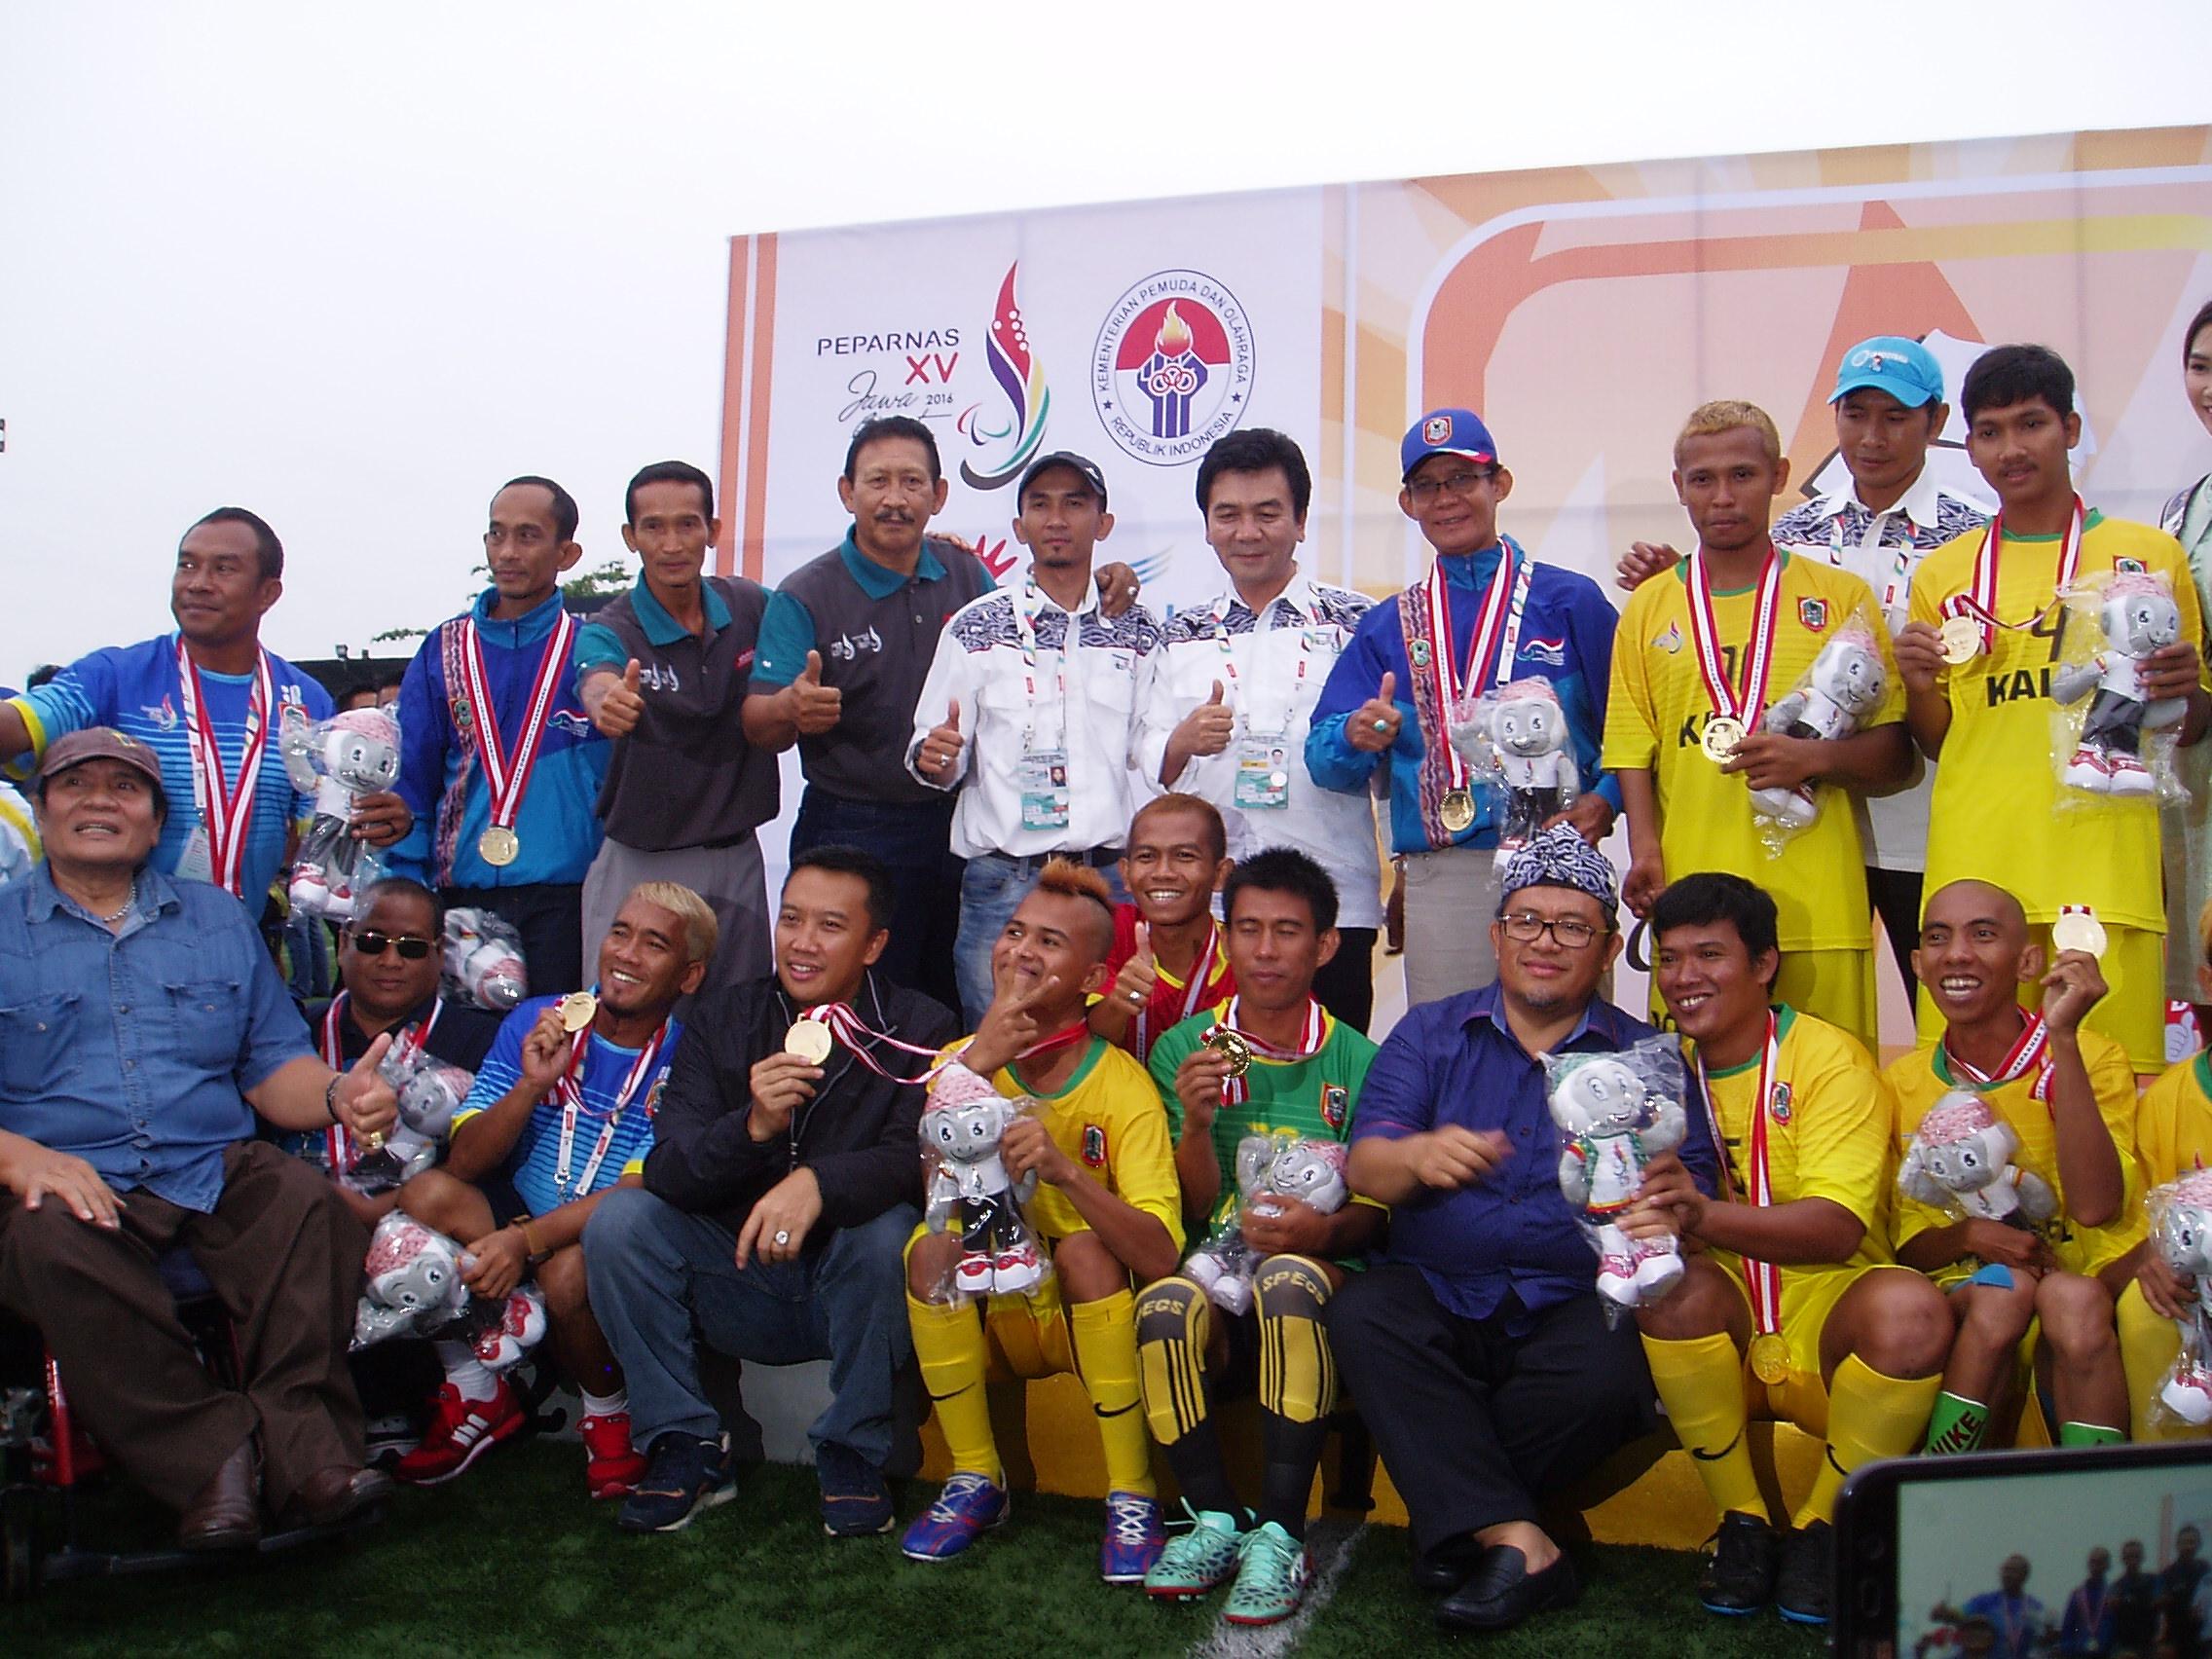 Ketua NPCI Pusat Sonny Marbun (ujung kiri),u00a0Menpora Imam Nahrawi, dan Ketua Umum PB Peparnas XV/2016 Jawa Barat Ahmad Heryawan, berfoto bersama tim sepakbola Kalimantan Selatan mendapat medali emas, pada 23 Oktober 2016. Foto oleh Yuli Saputra/Rappler